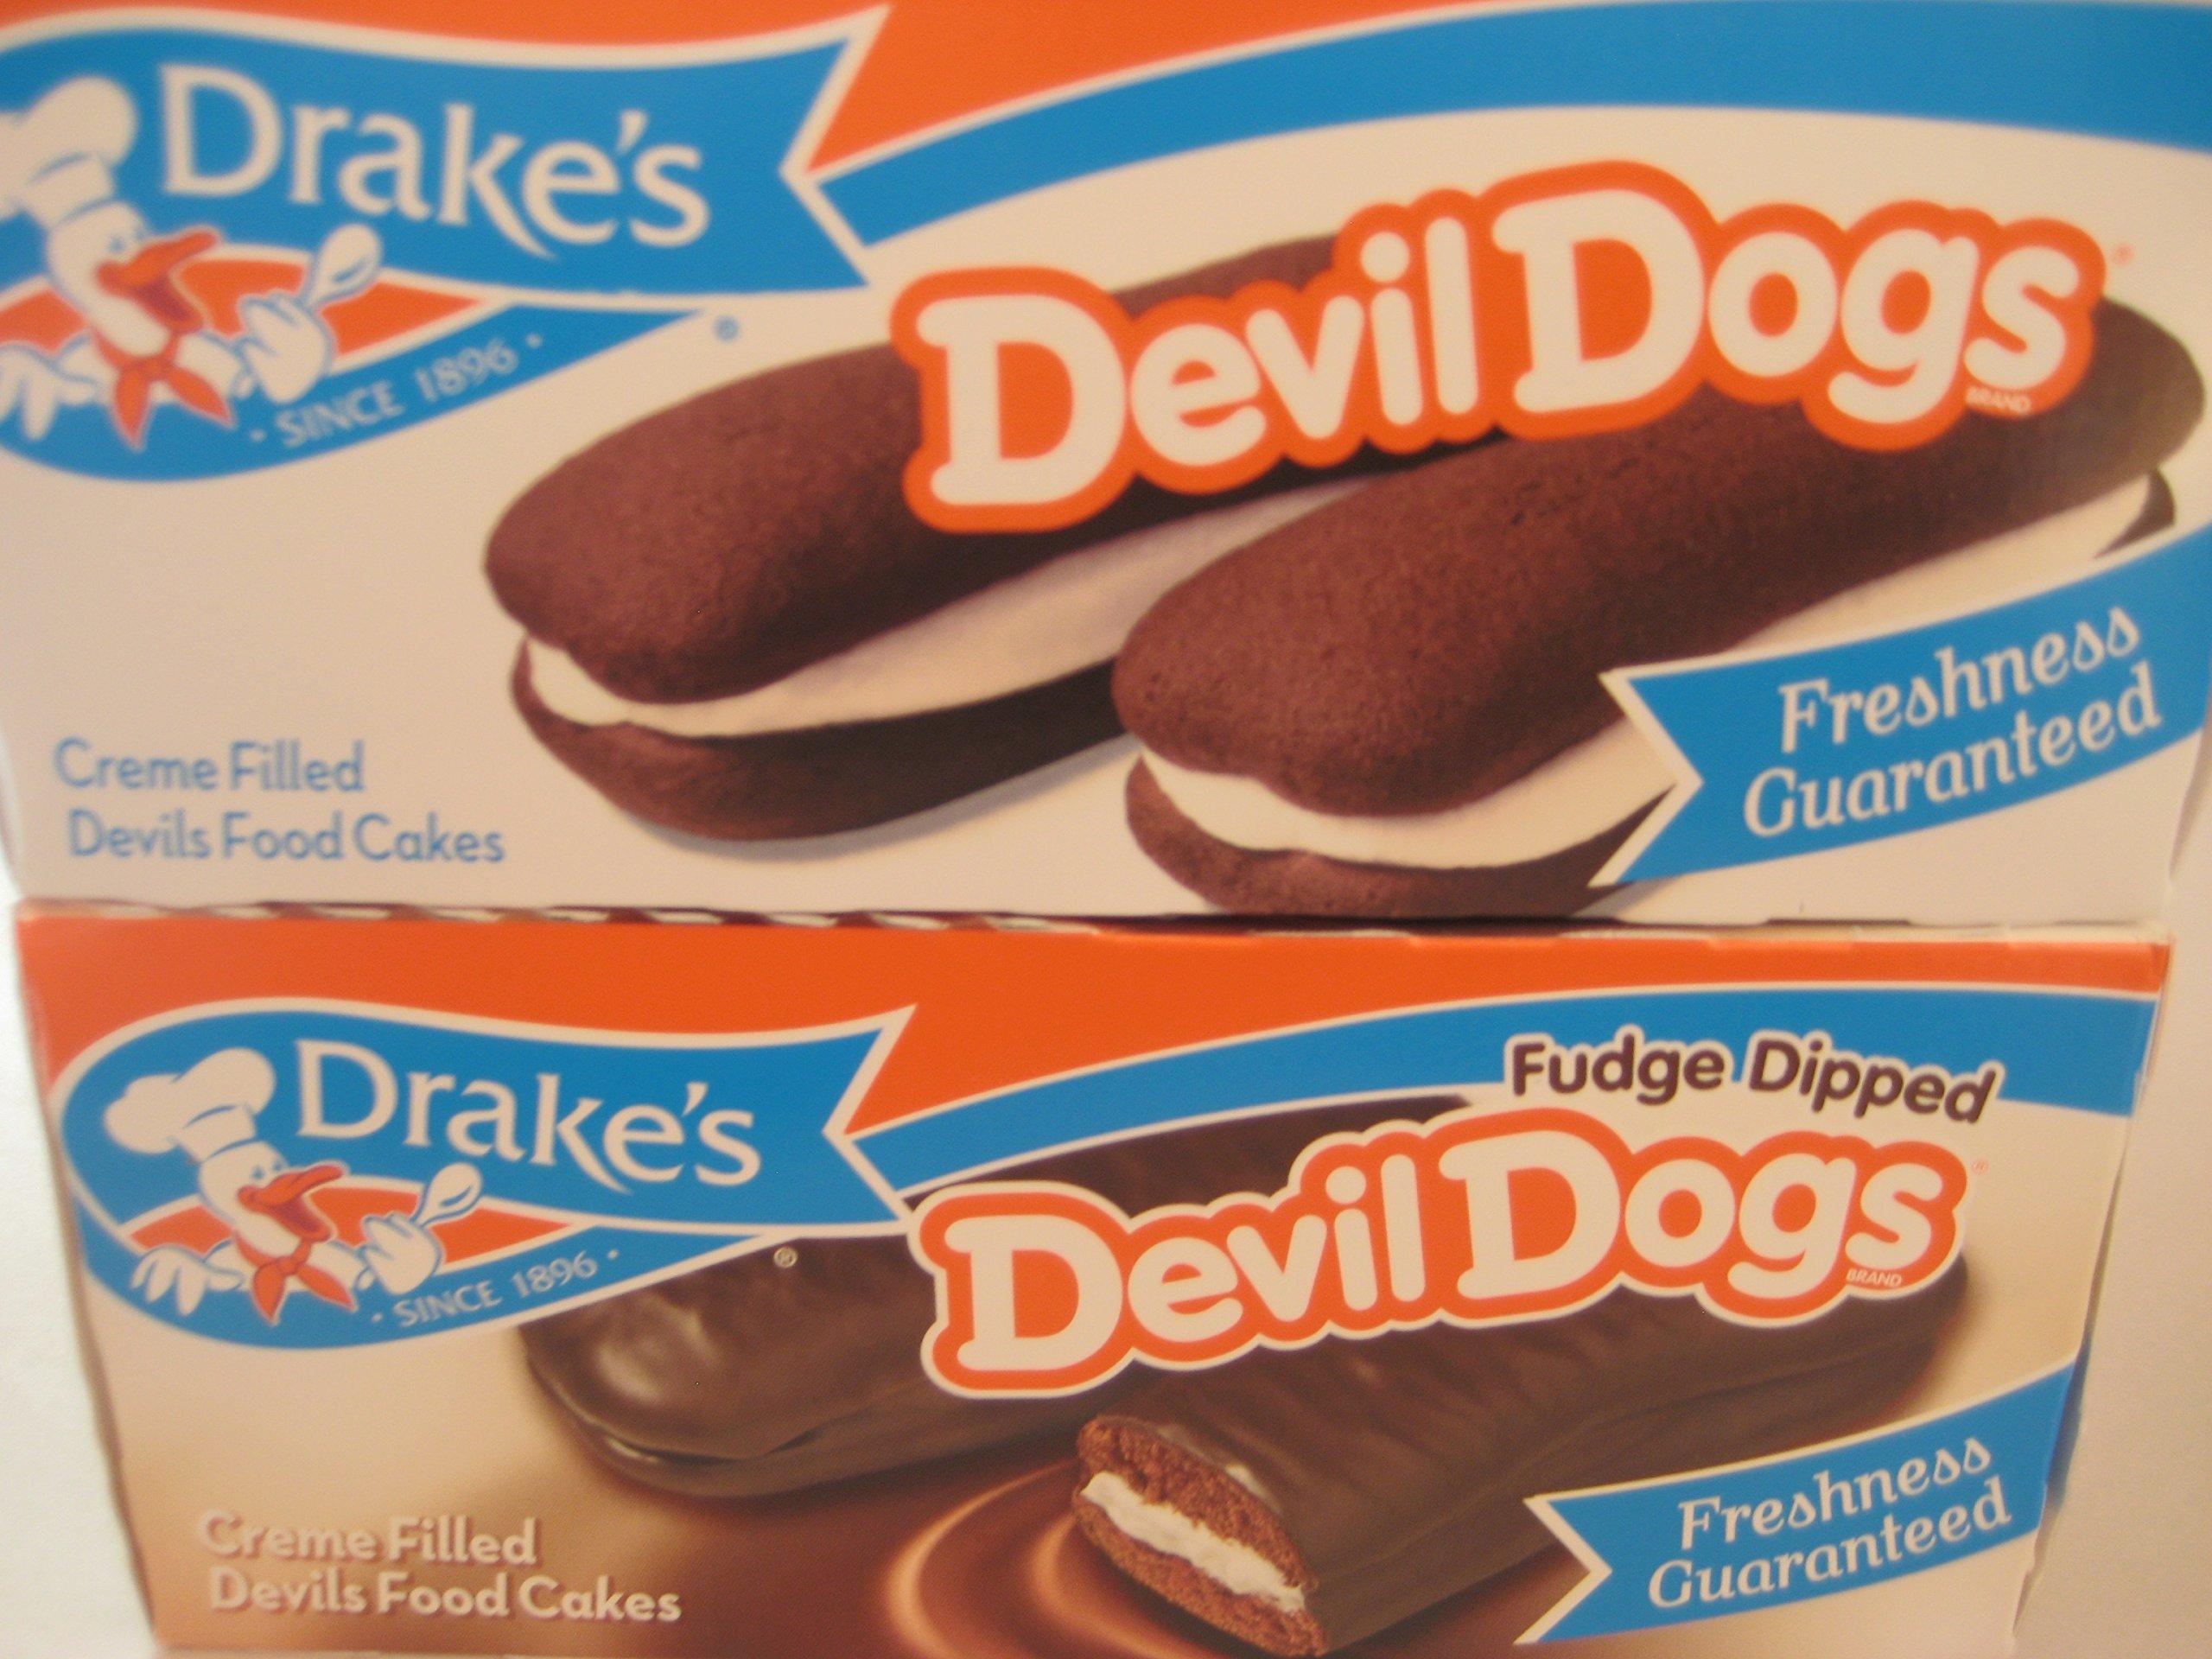 Drake's Fudge Dipped Devil Dogs & Drakes Devil Dogs Combo Bundle. by Drake's